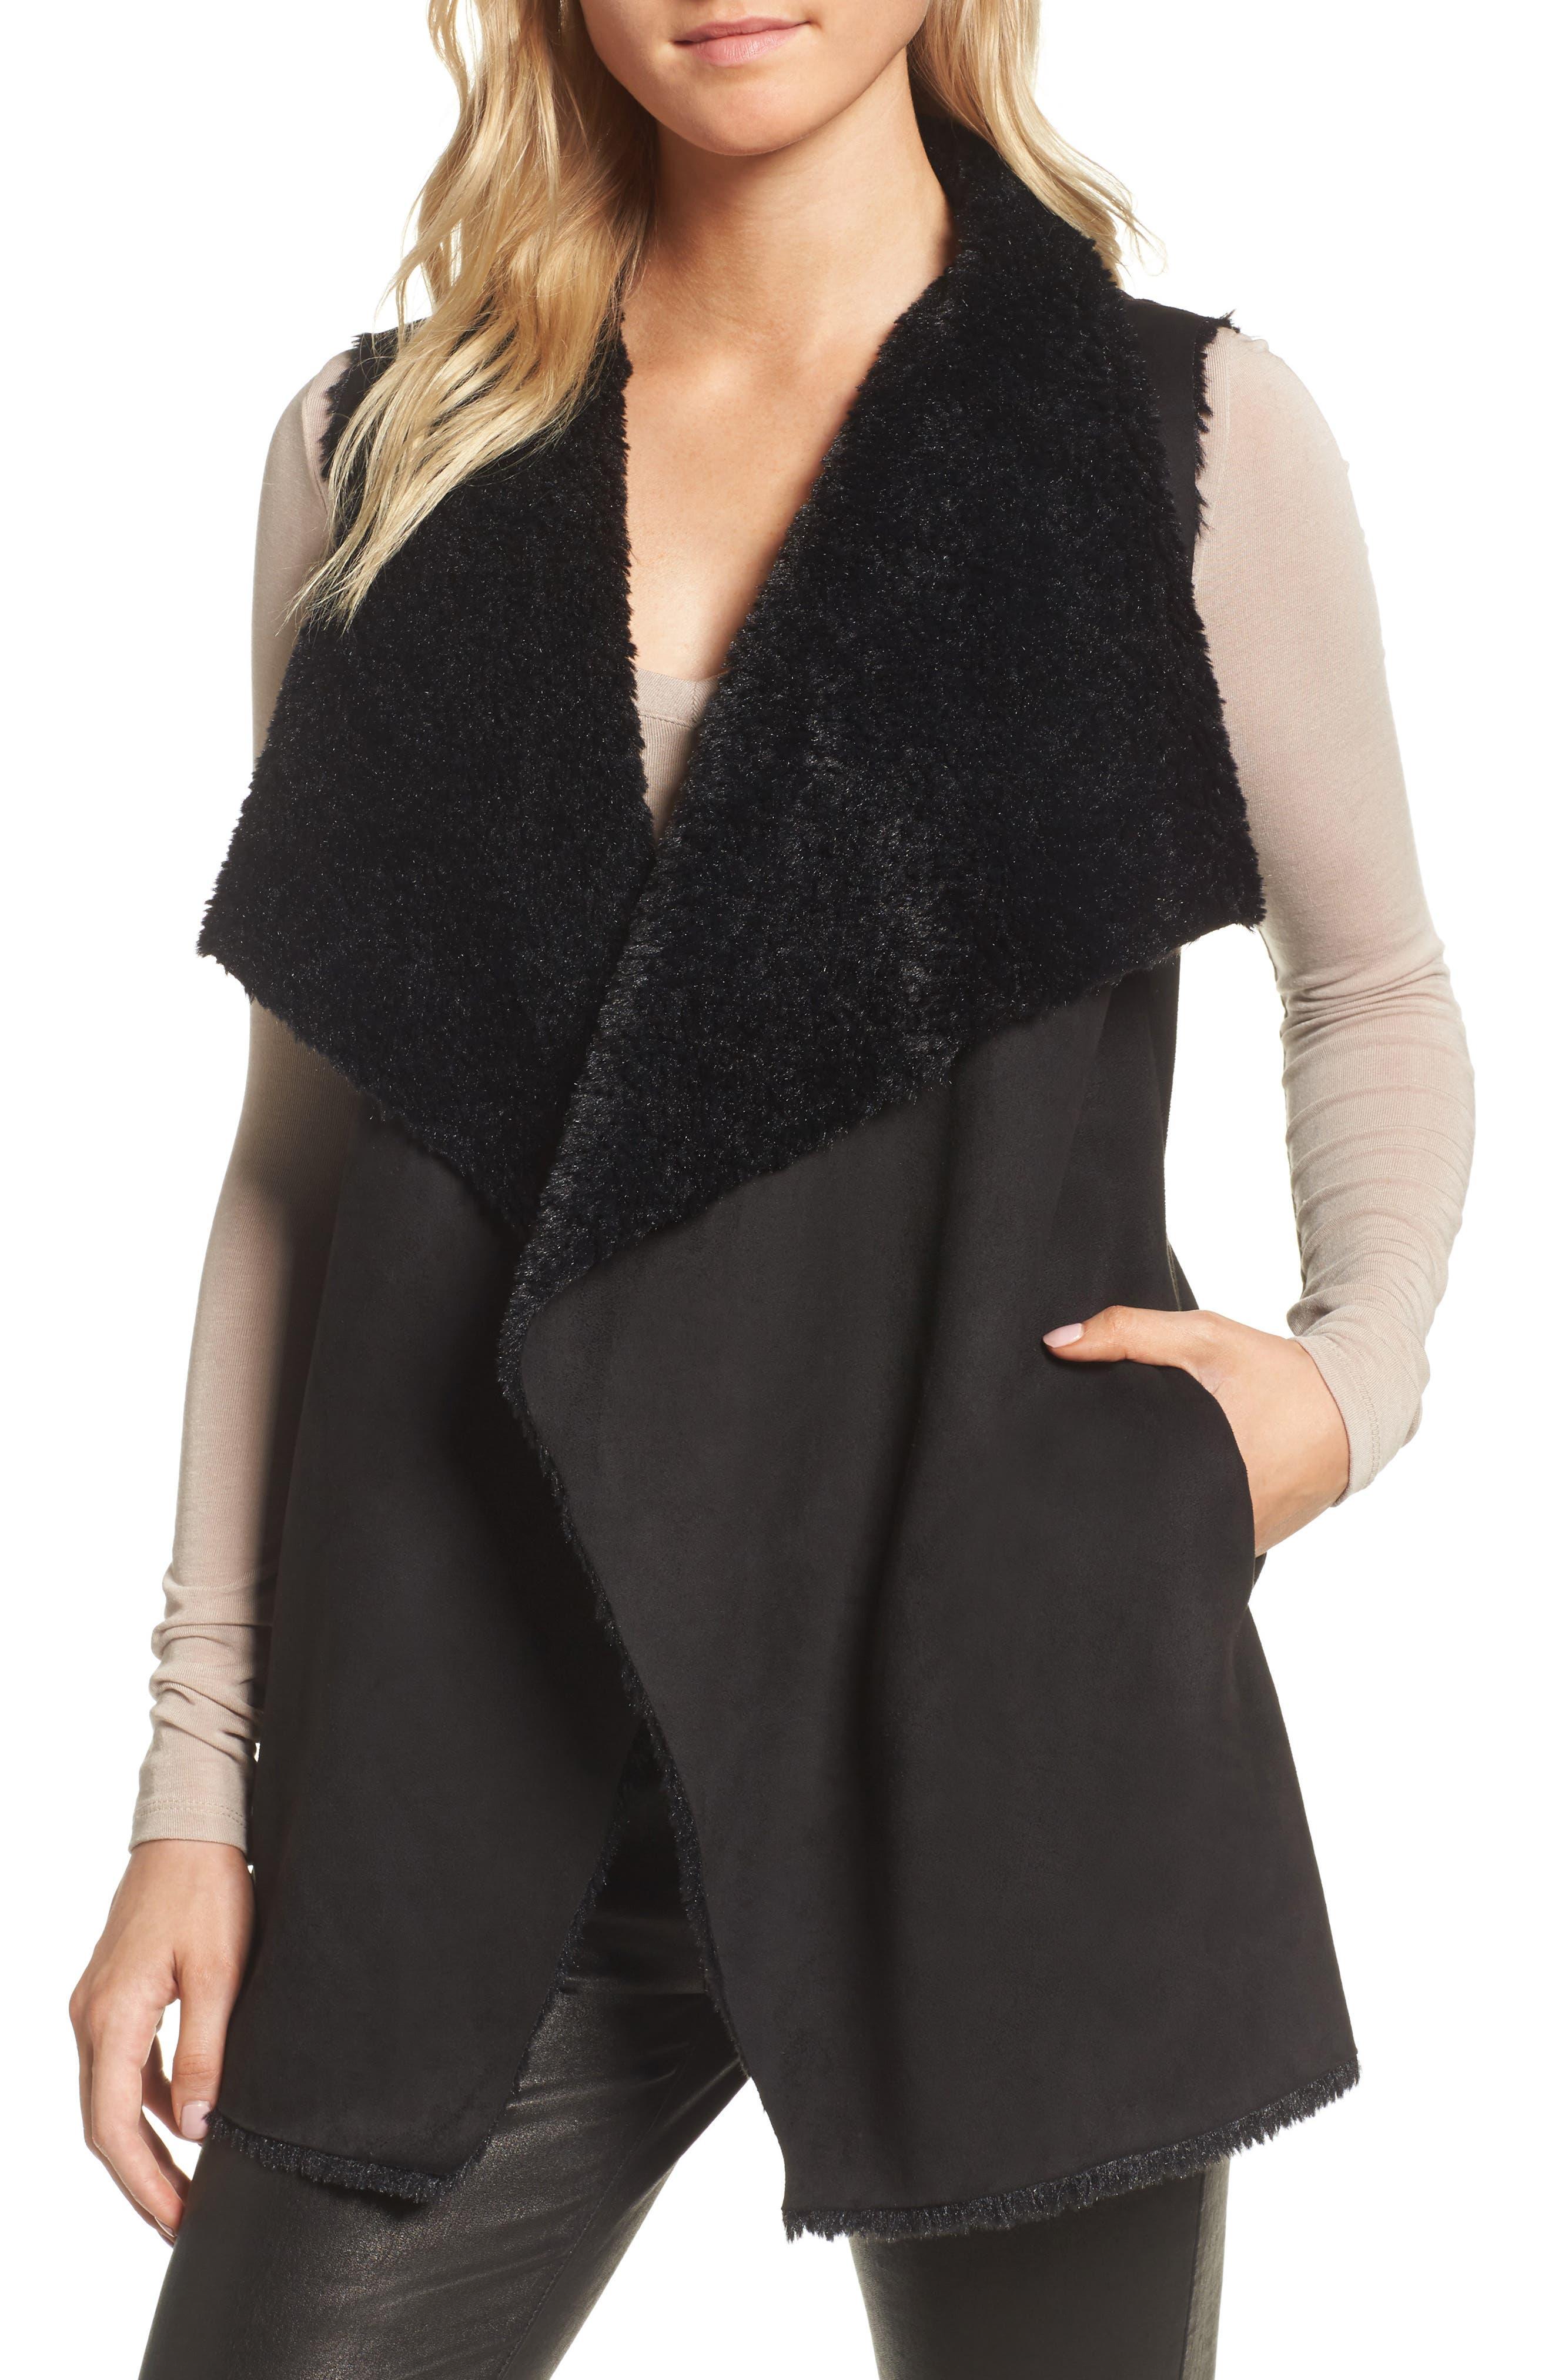 Avalonia Faux Shearling Vest,                             Main thumbnail 1, color,                             Black